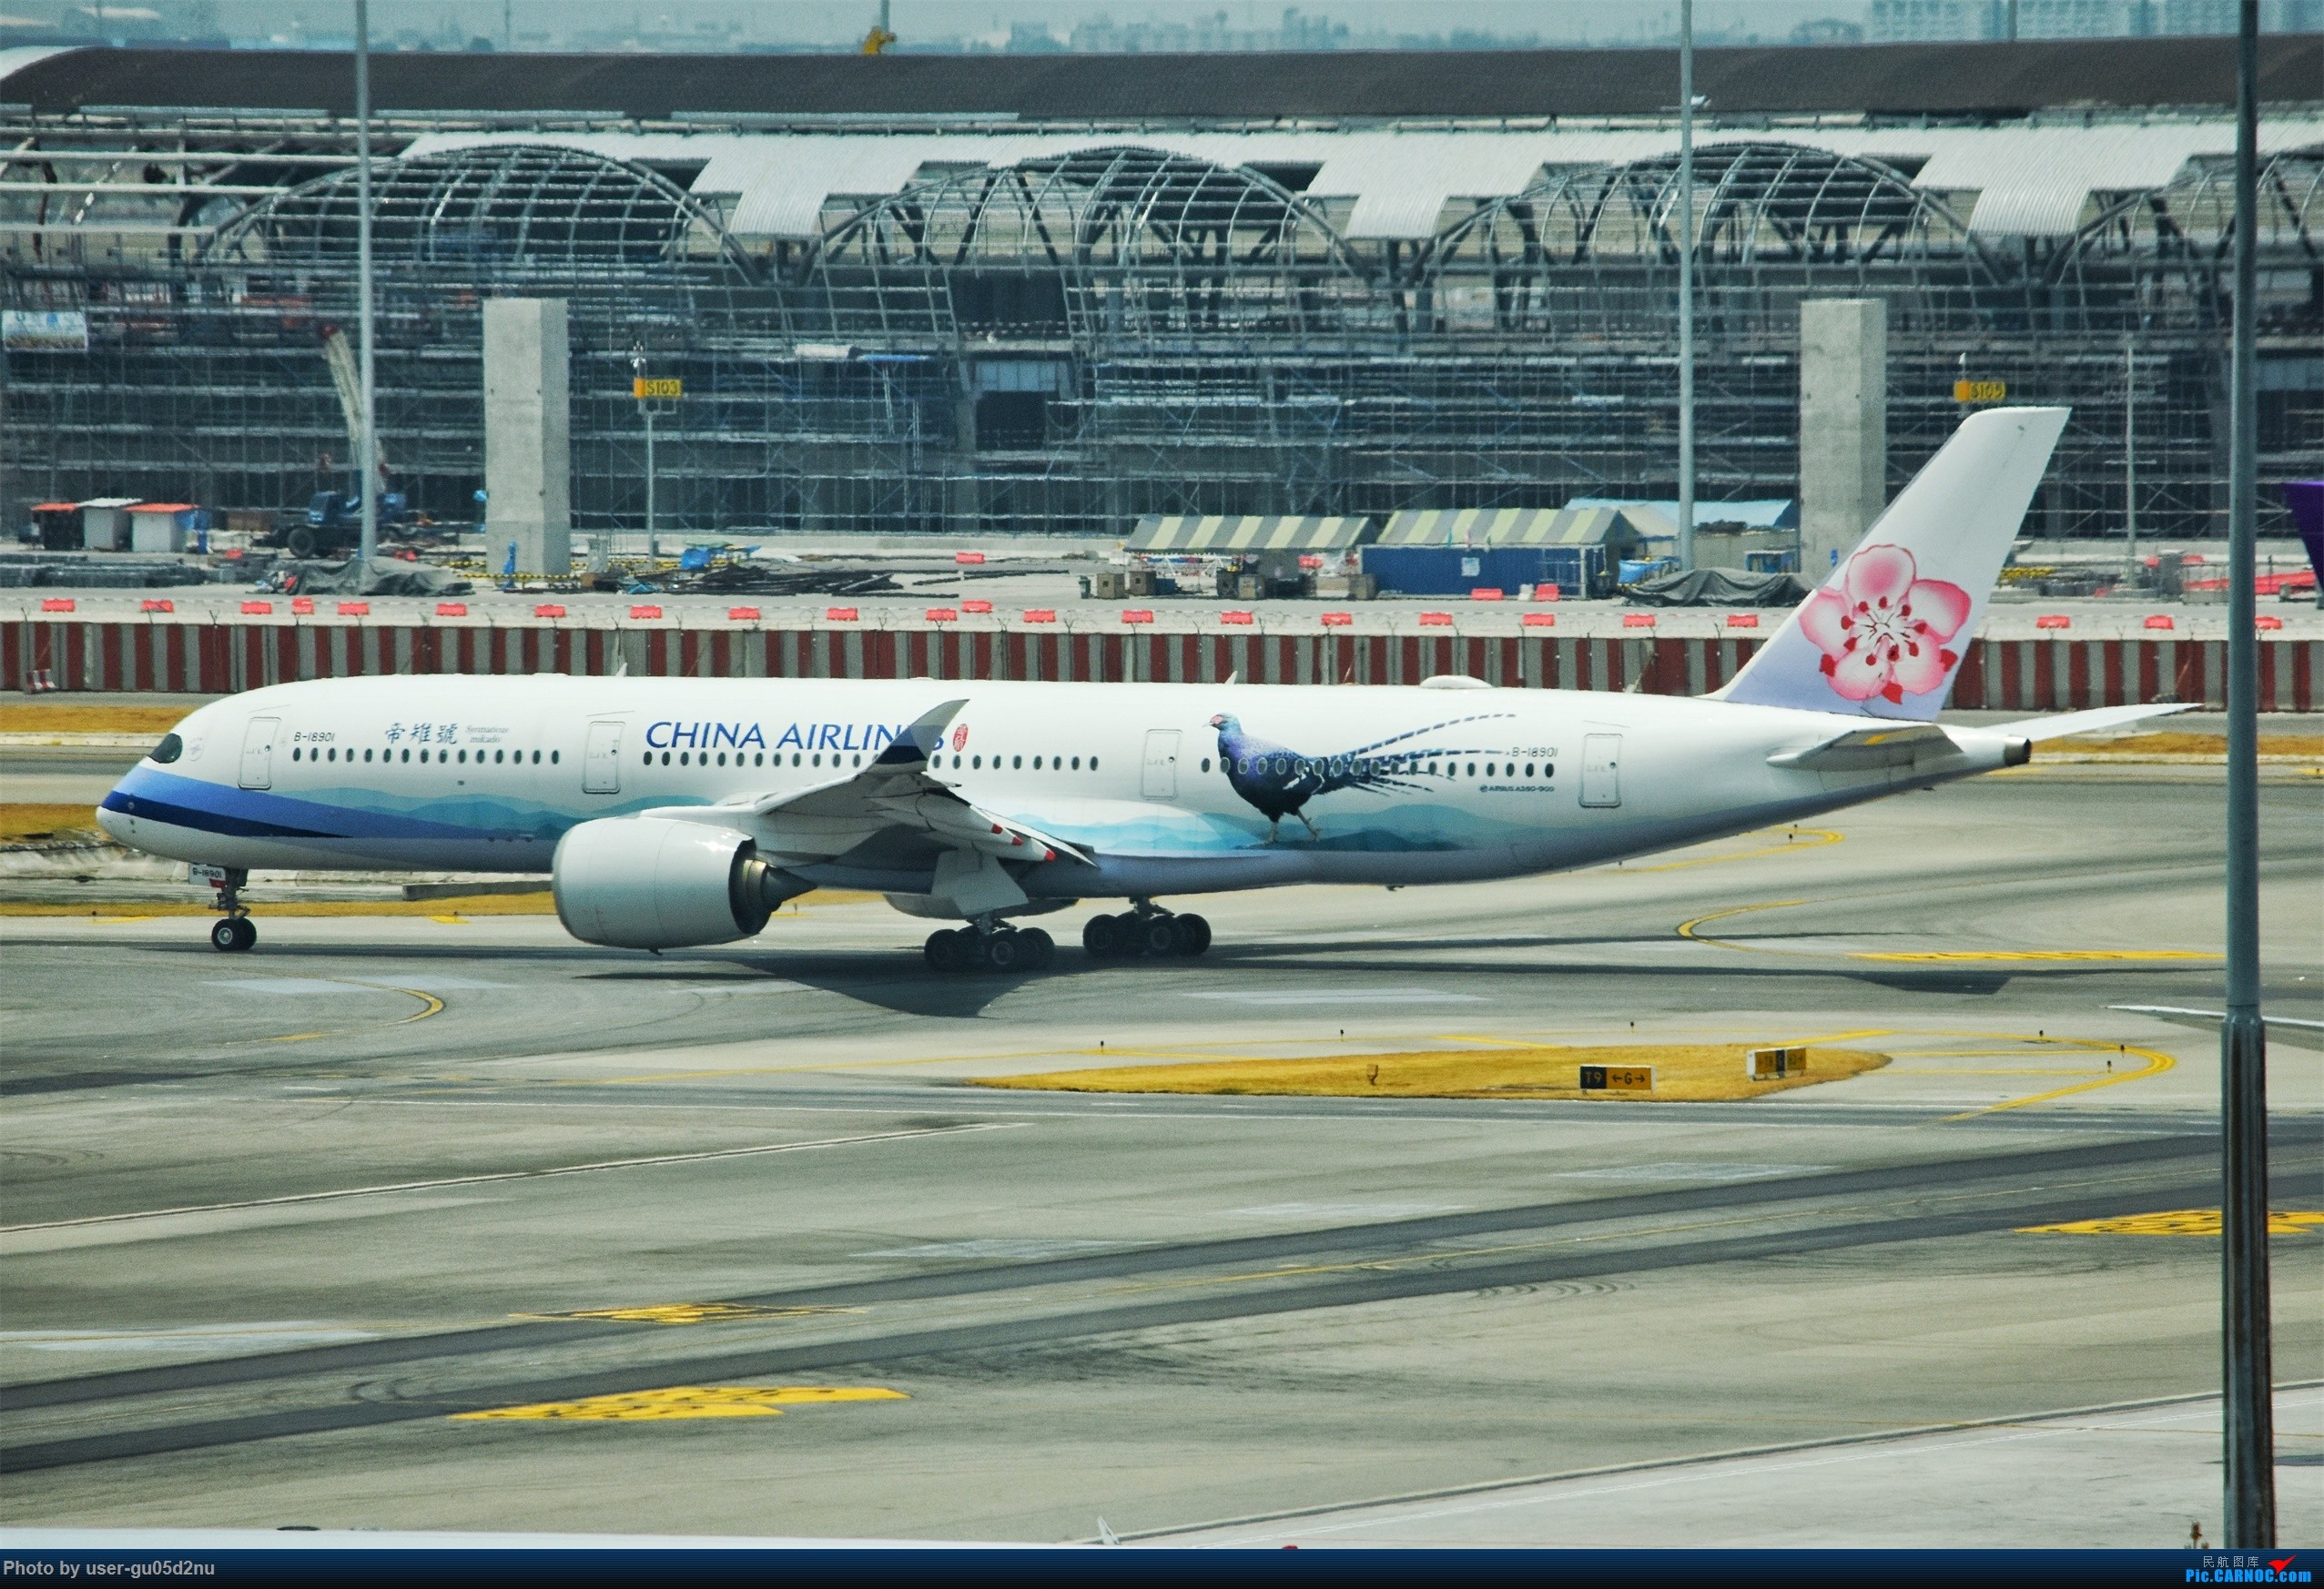 Re:[原创]曼谷素万那普观景平台视角【滑行篇】 AIRBUS A350-900 B-18901 Suvarnabhumi Airport